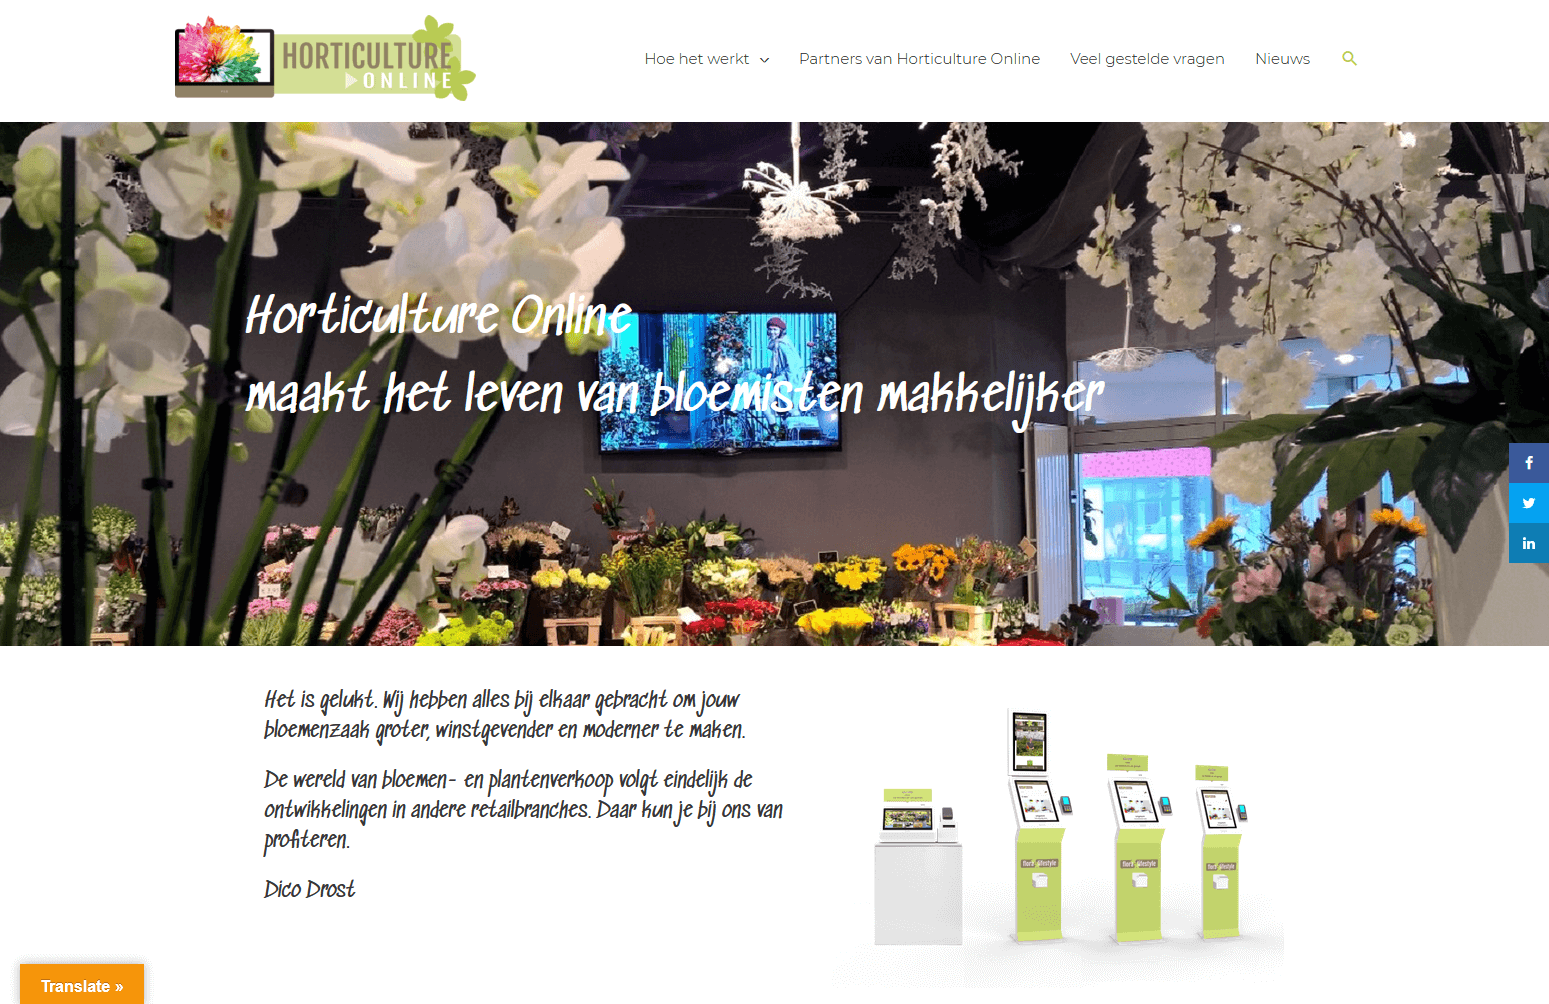 190125 Horticulture online website